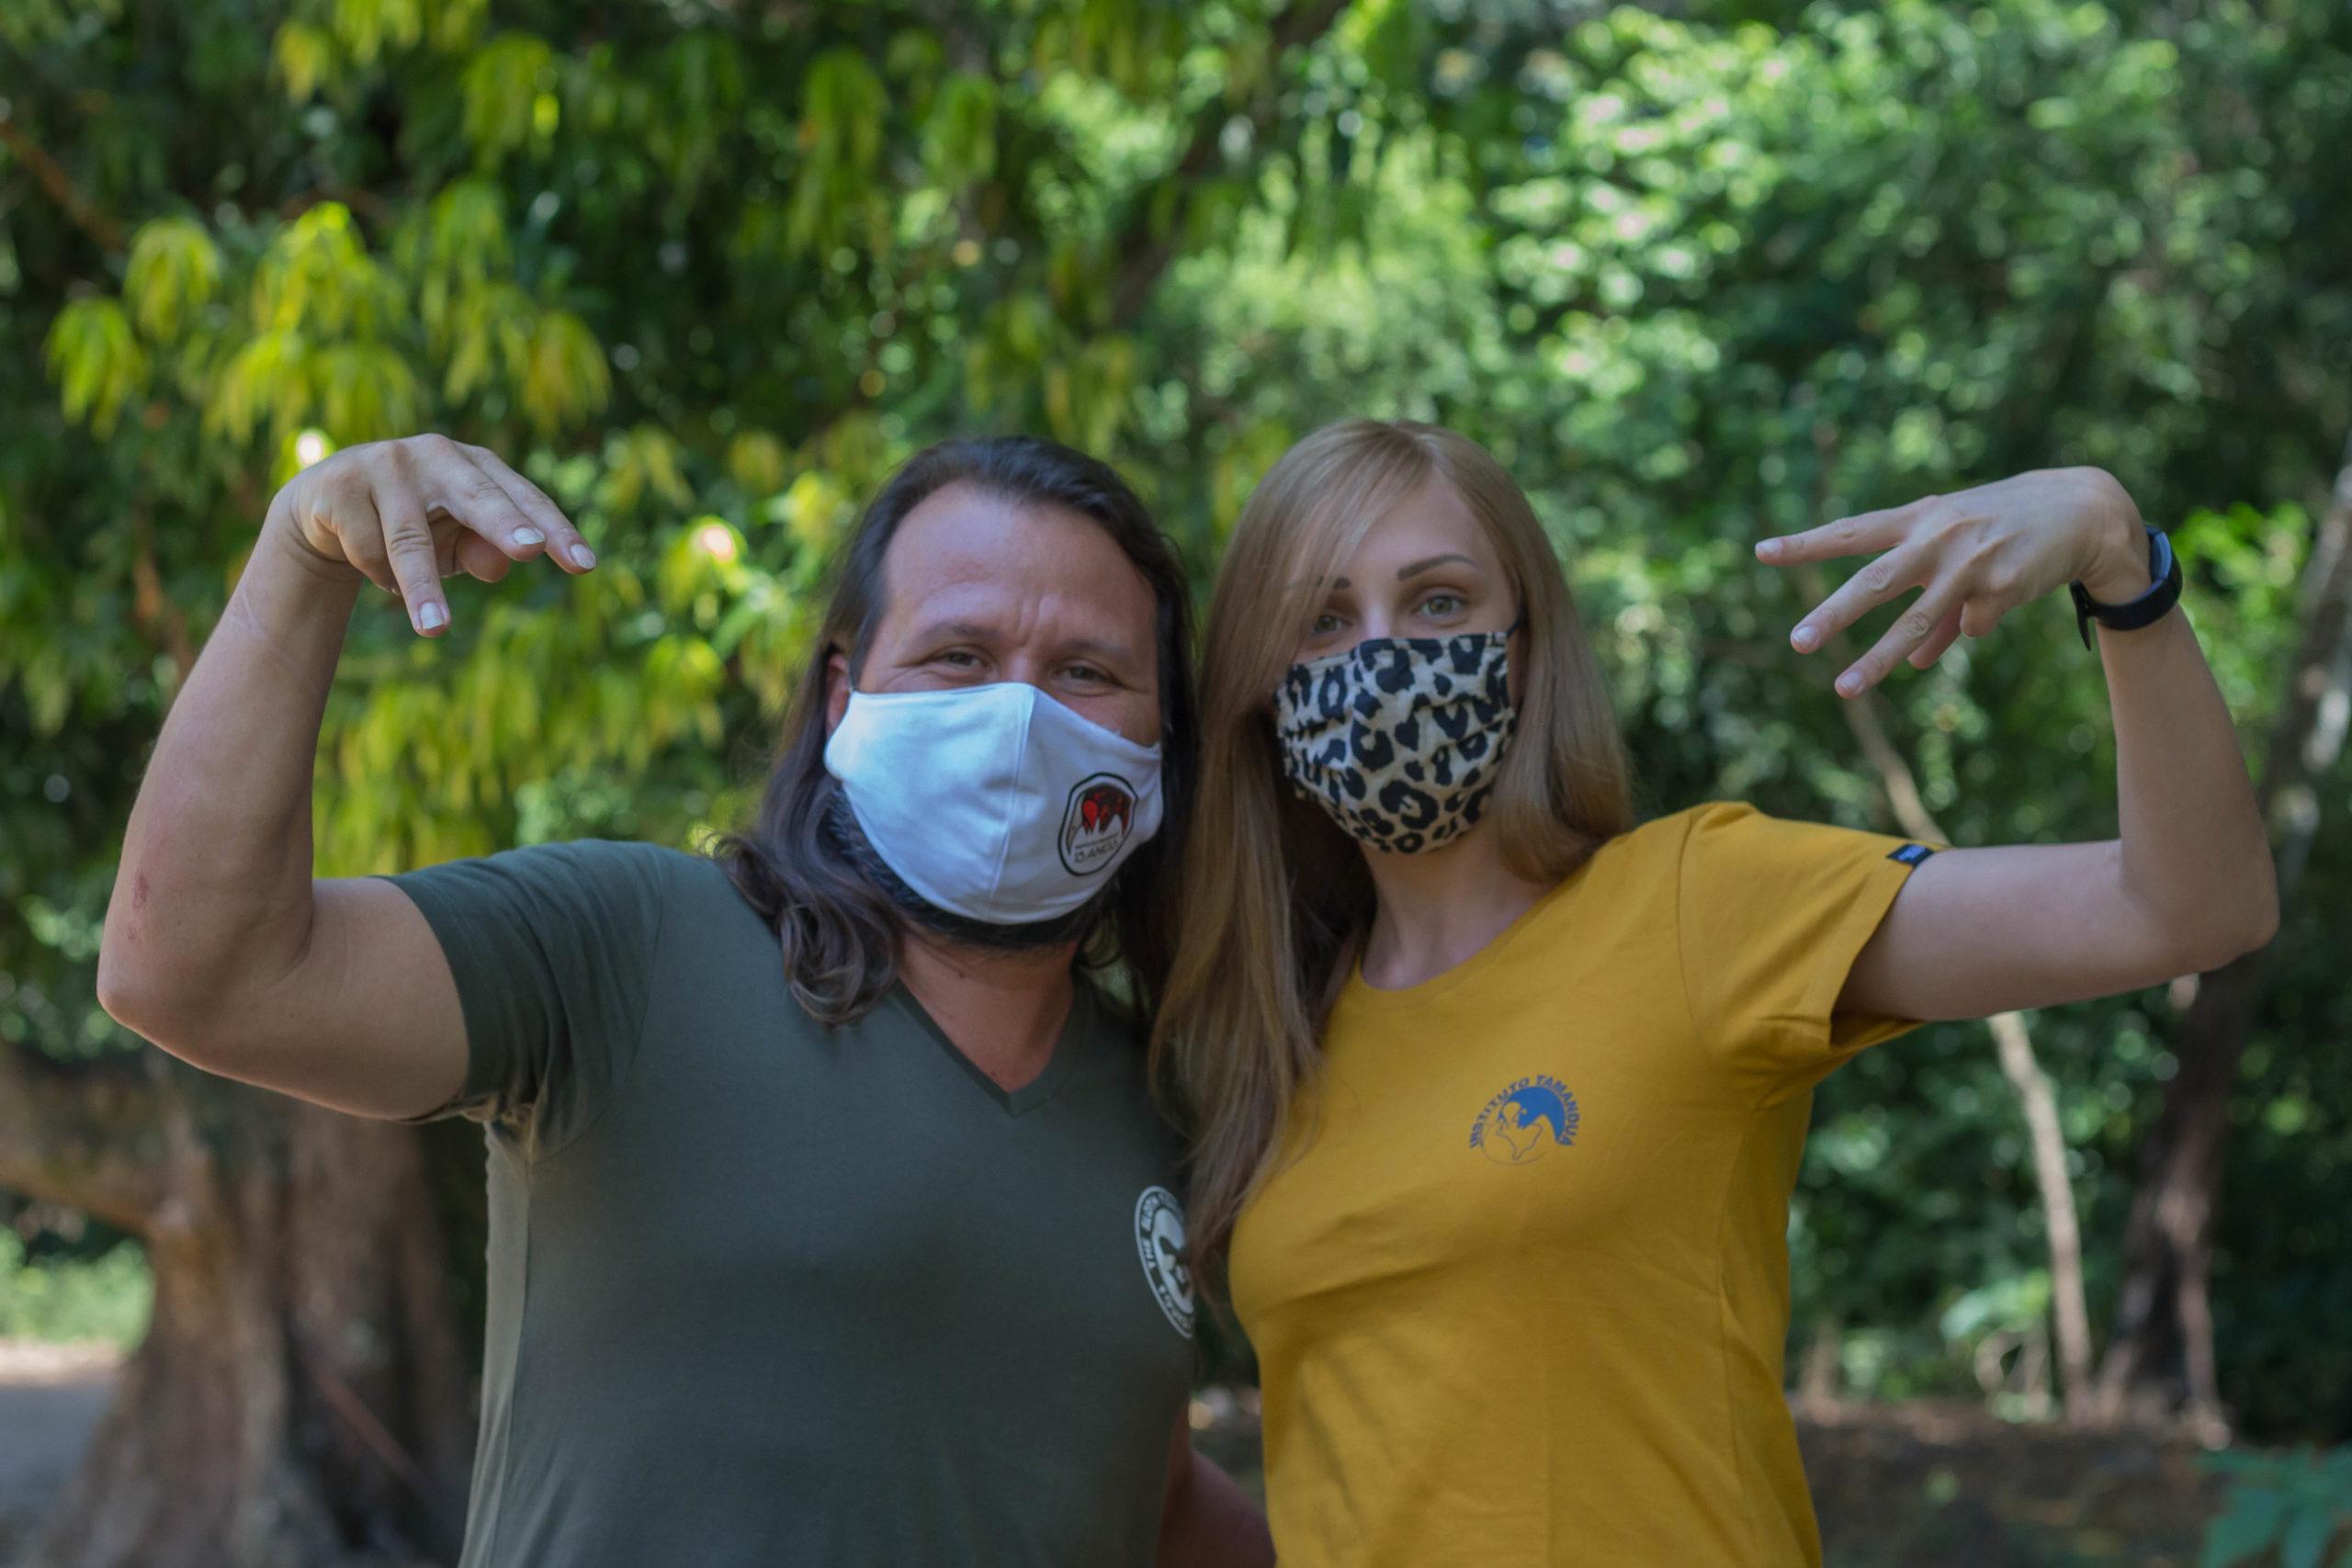 maned sloth team